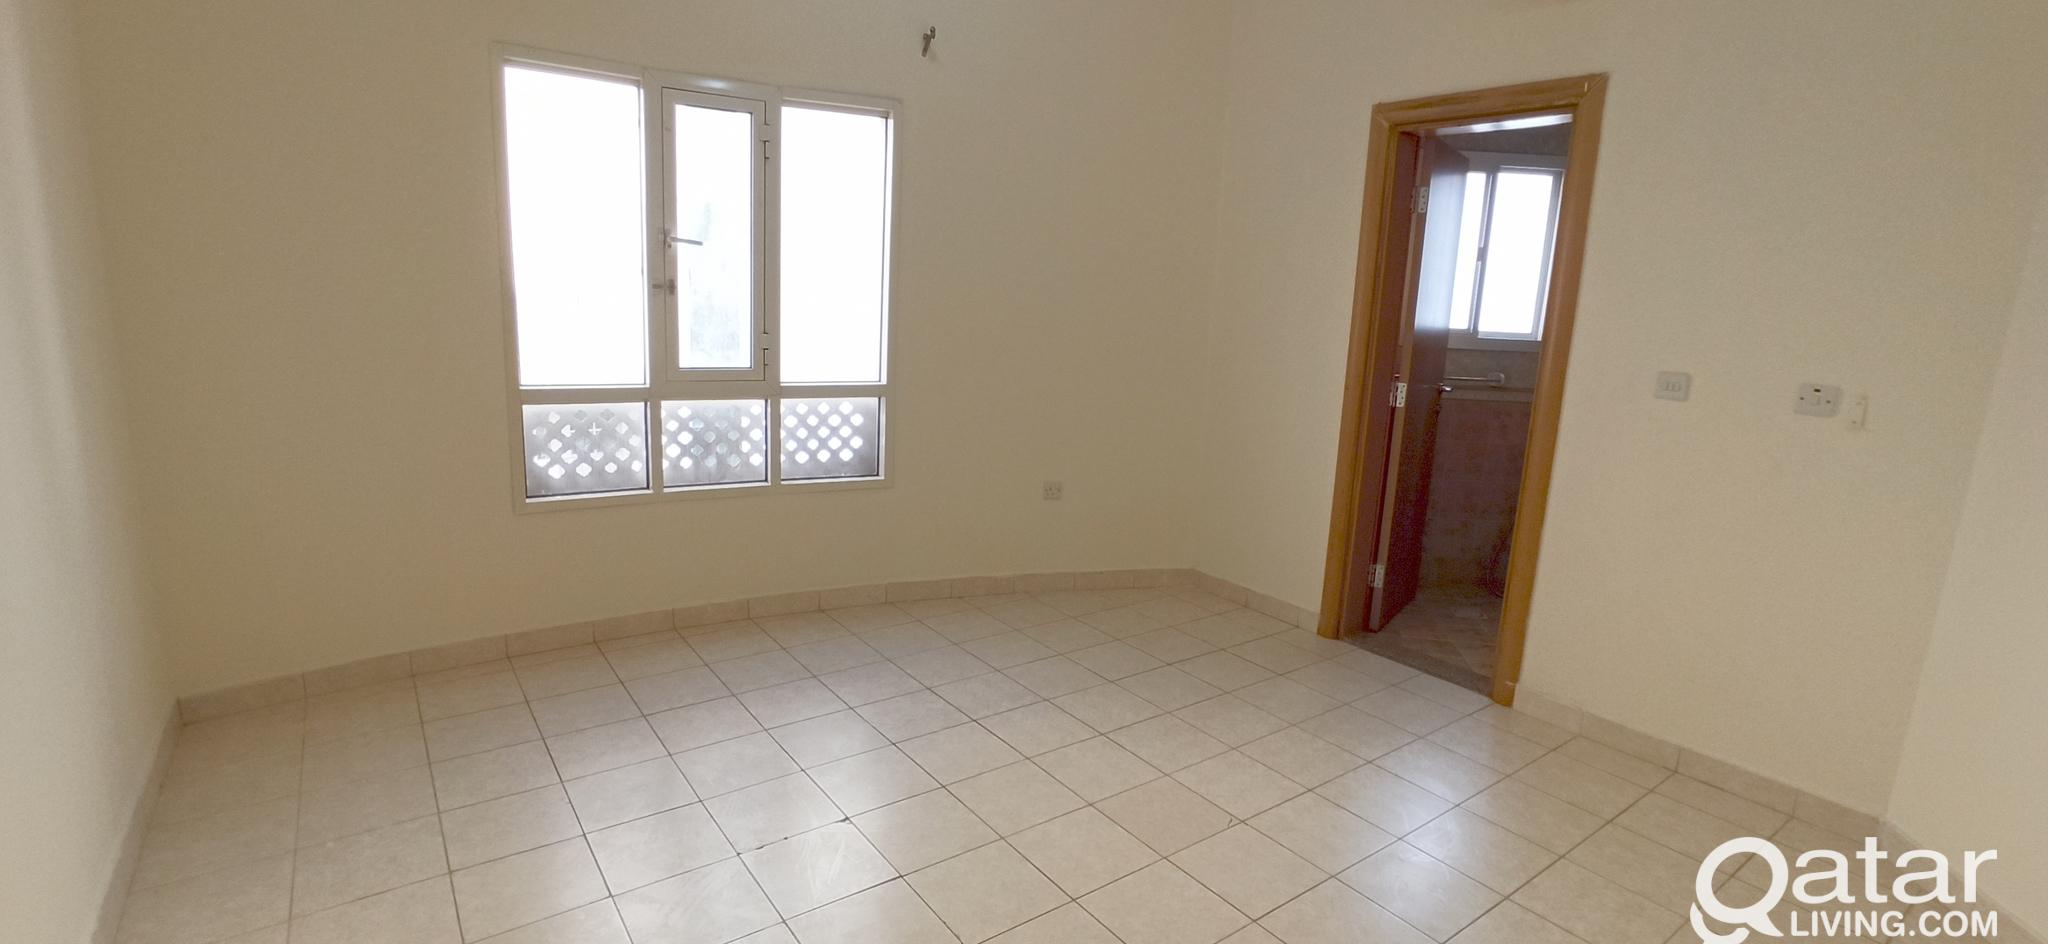 VERY GOOD 2 BED APART WITH 3 BATHROOMS IN MUNTAZAH